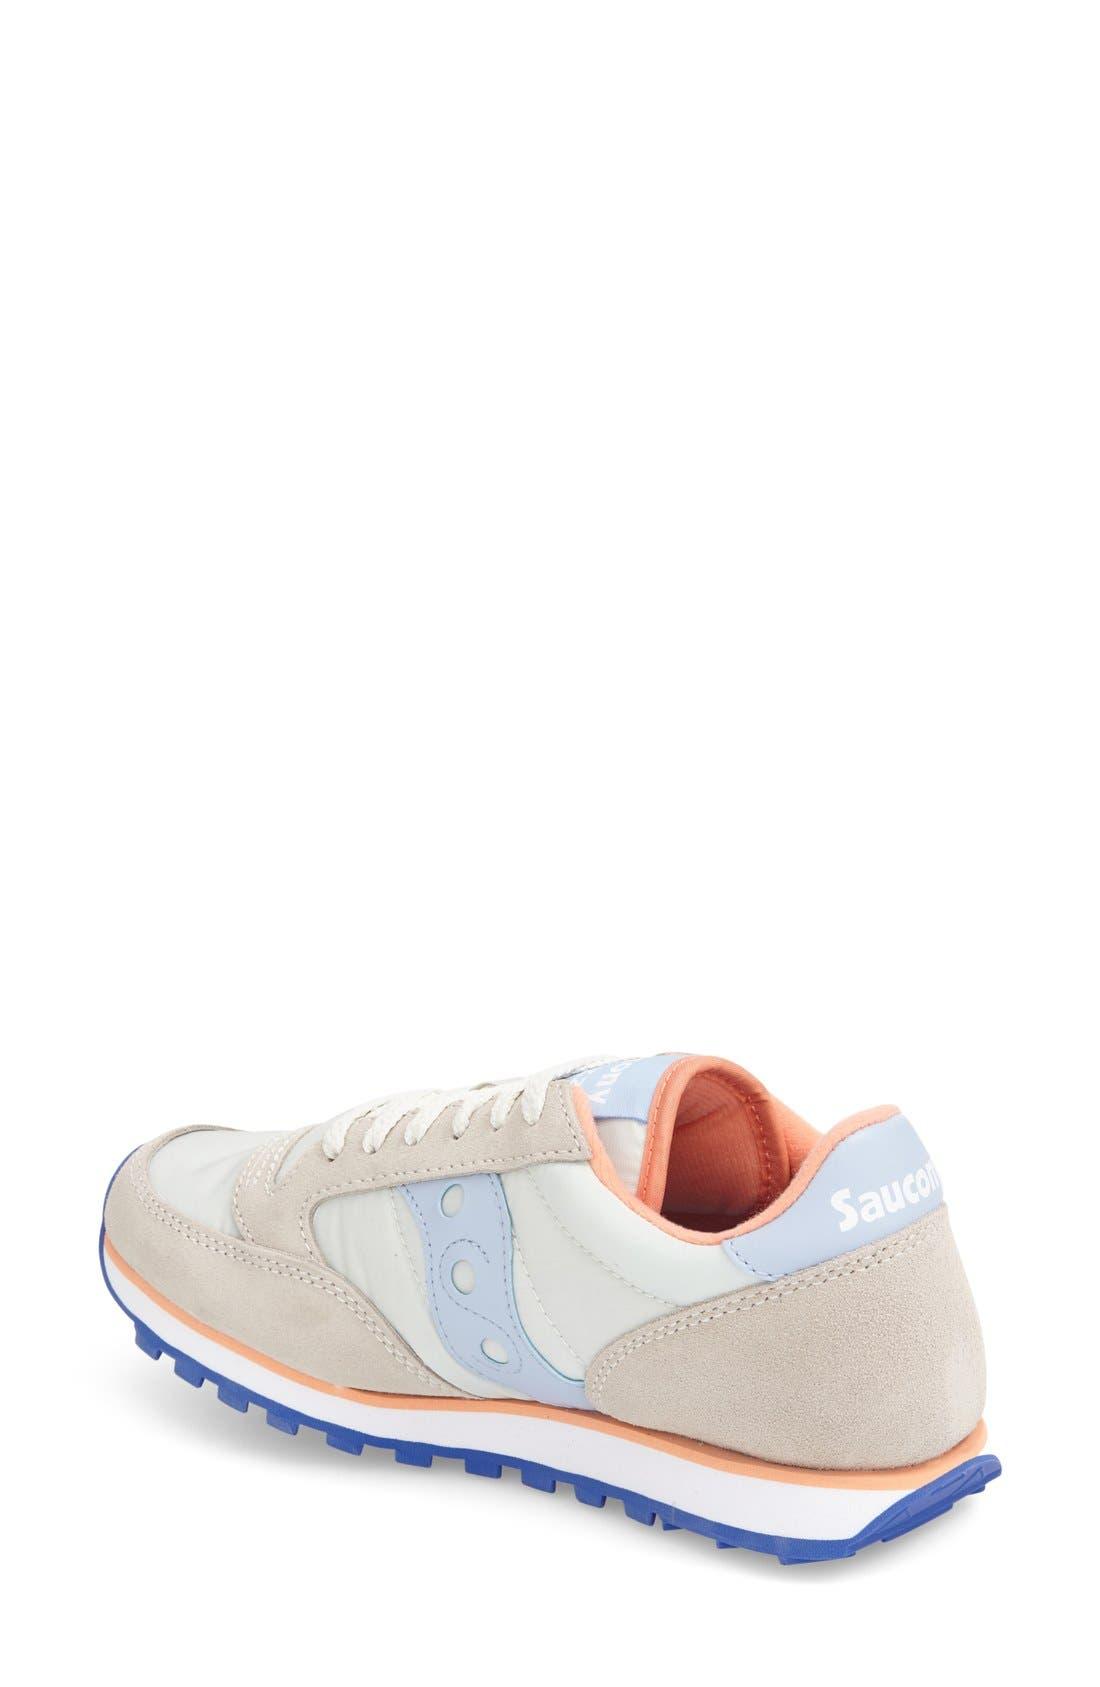 Alternate Image 2  - Saucony 'Jazz - Low Pro' Sneaker (Women)